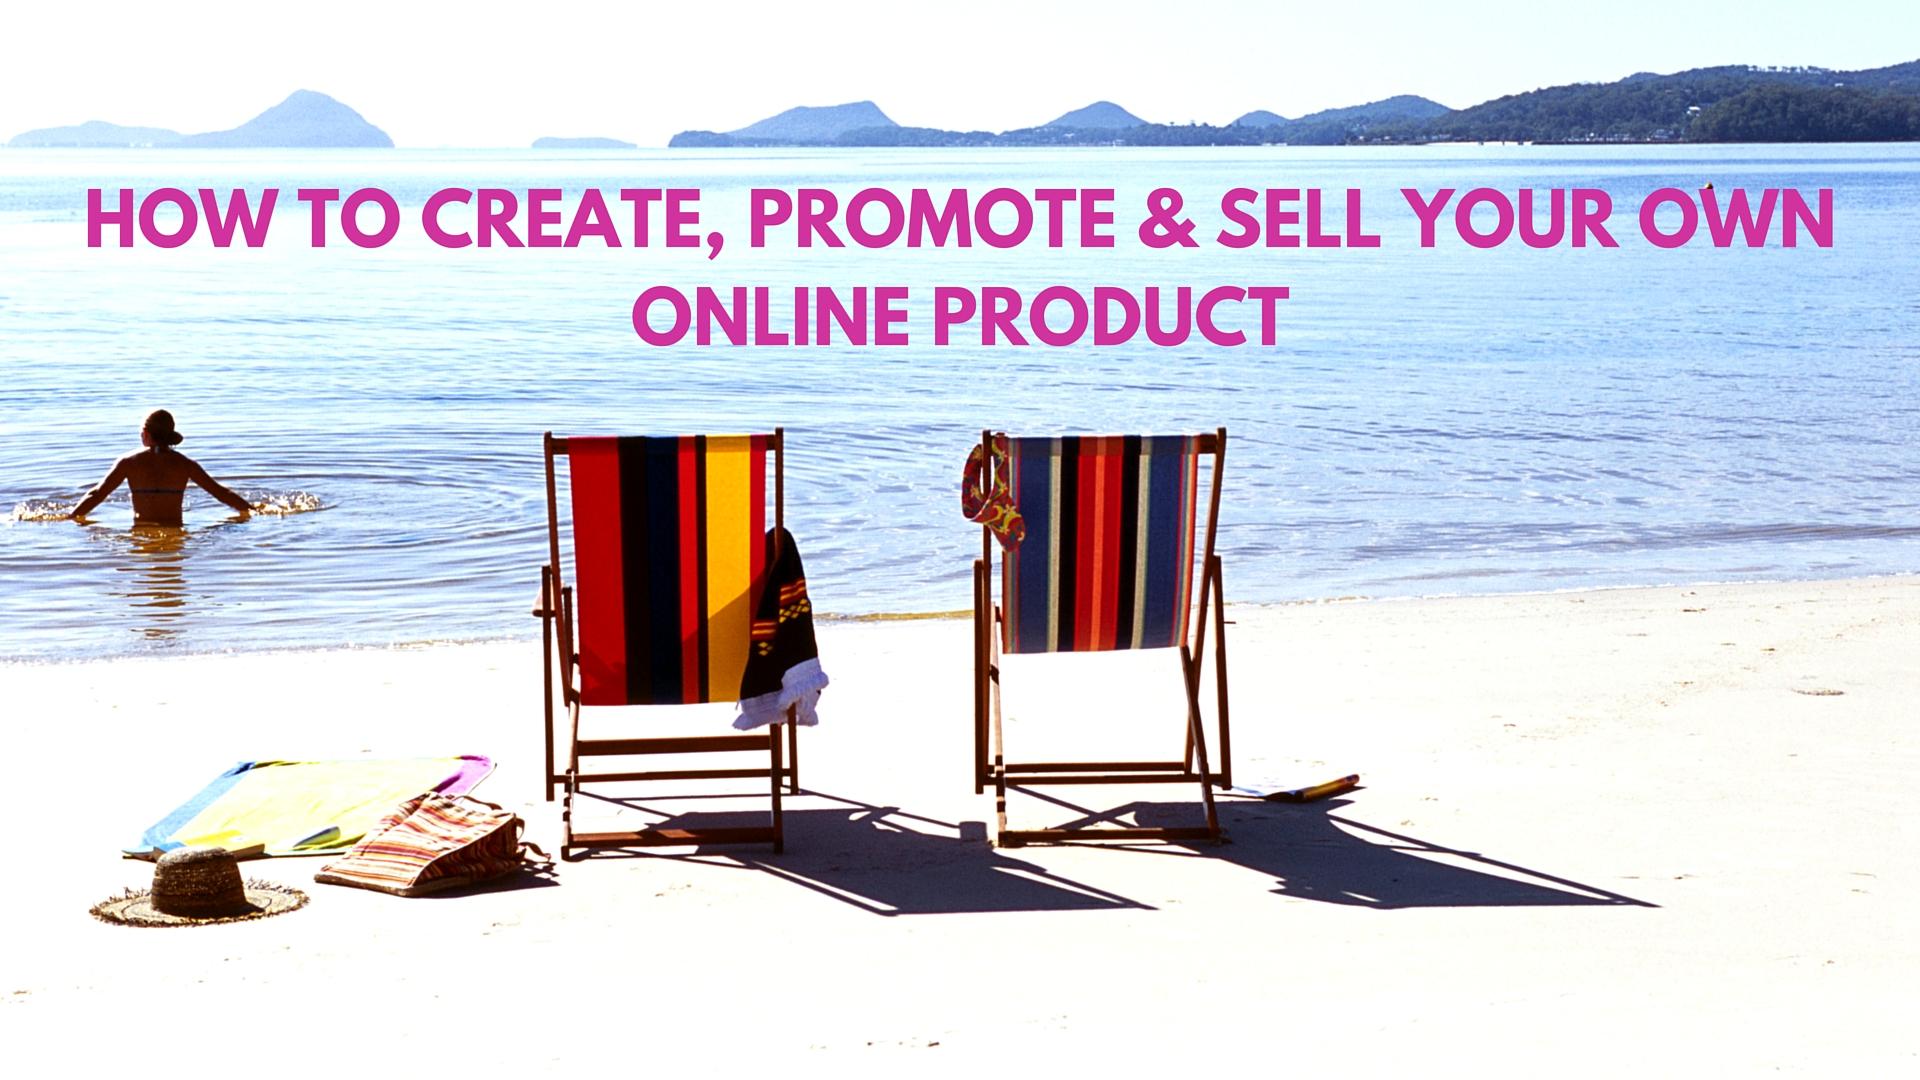 Create your own ecourse